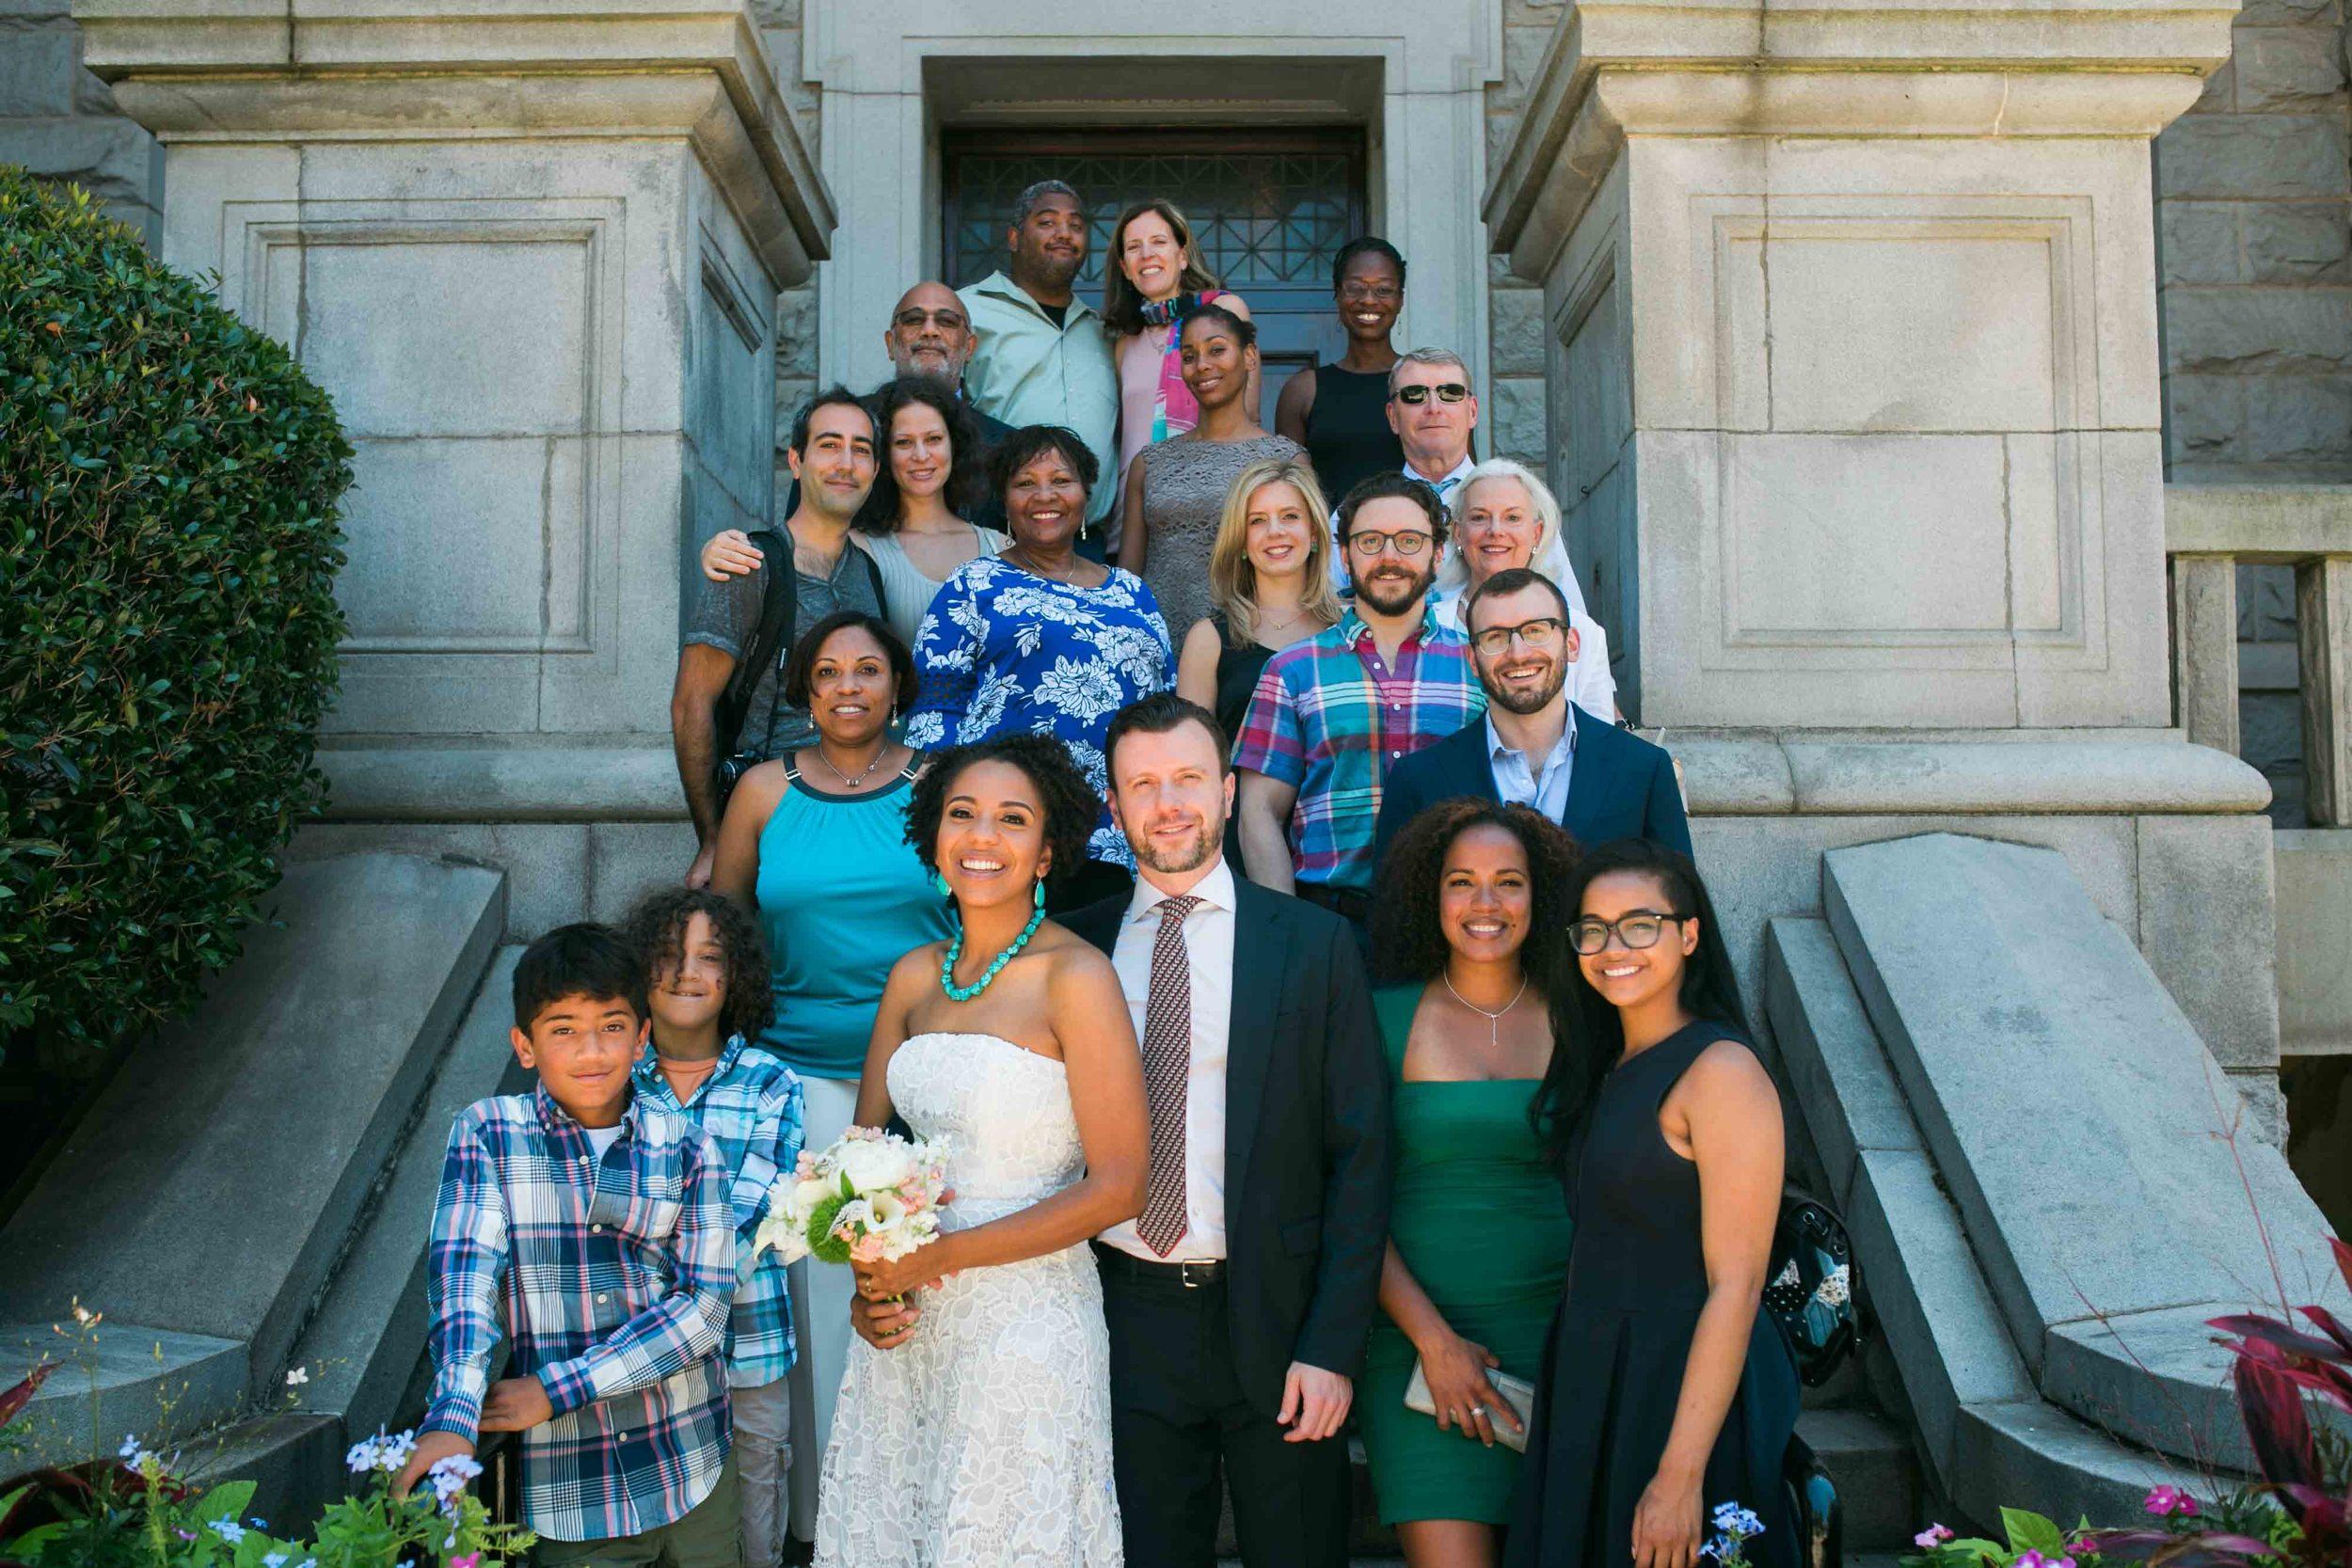 Dekalb-County-Courthouse-Wedding-Photos-Kiyah-C-Photography-44.jpg